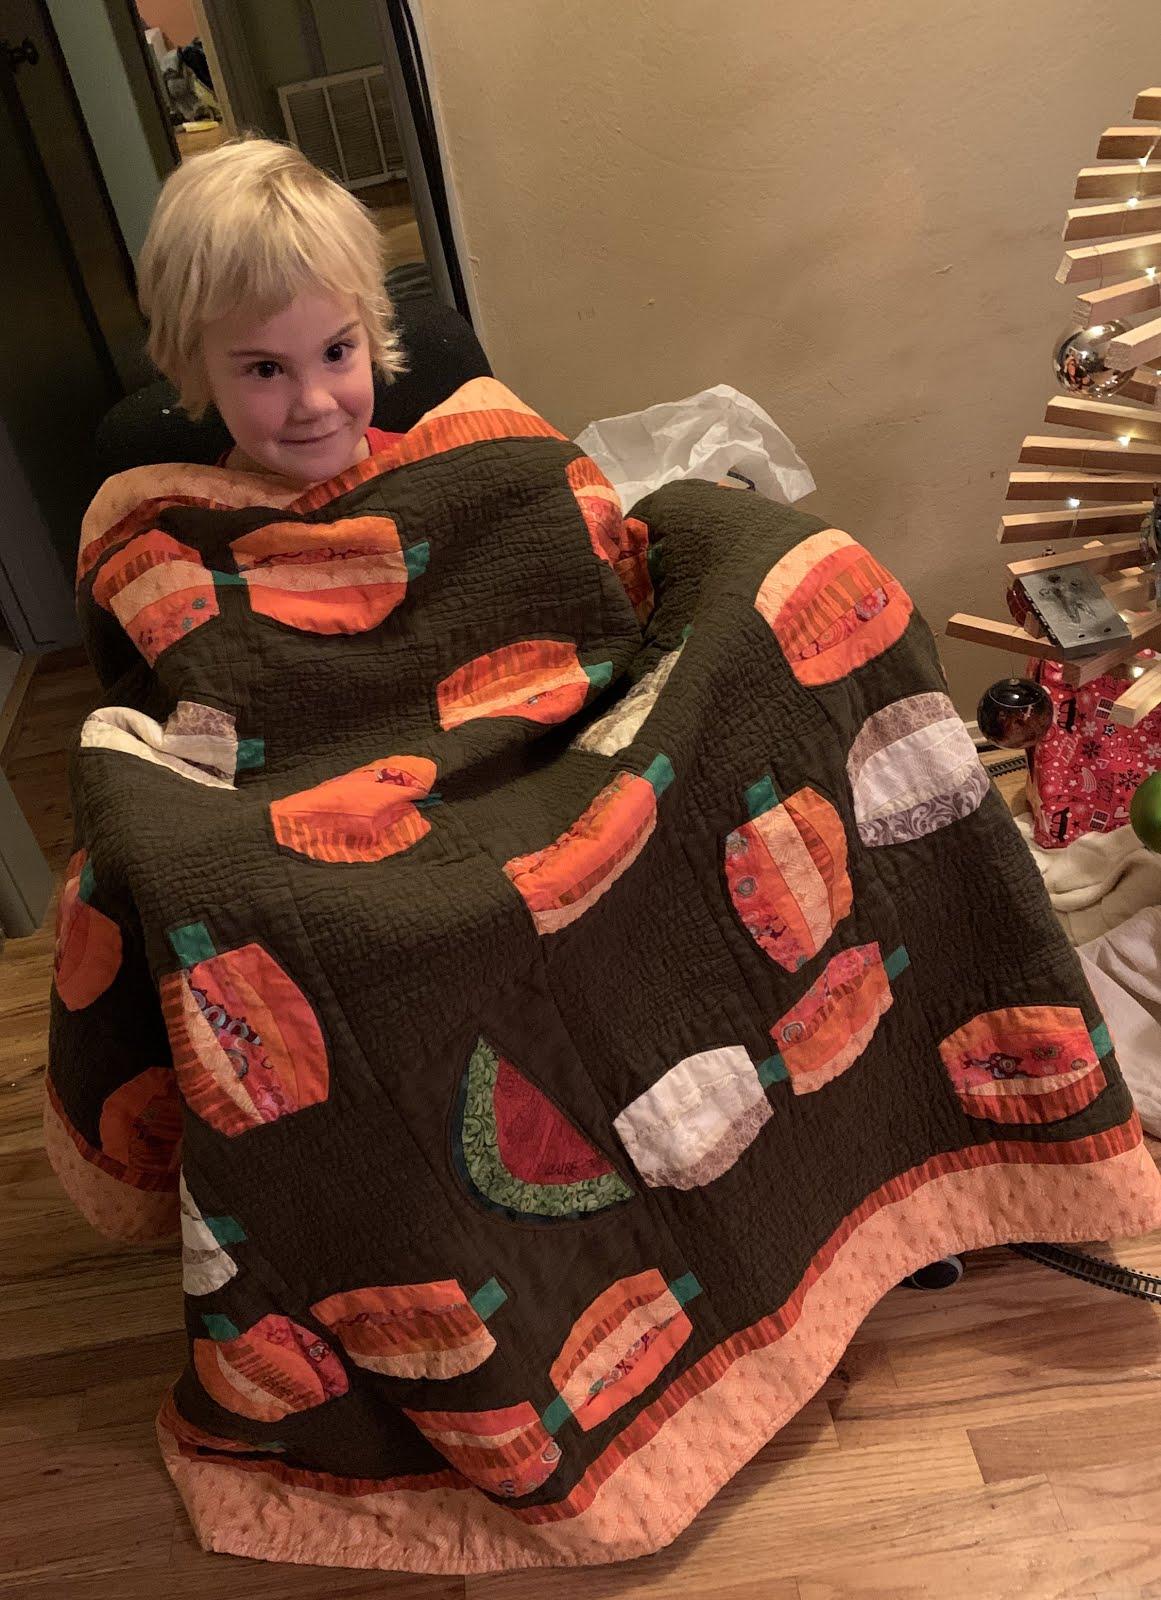 The True Origins of the Watermelon Quilt